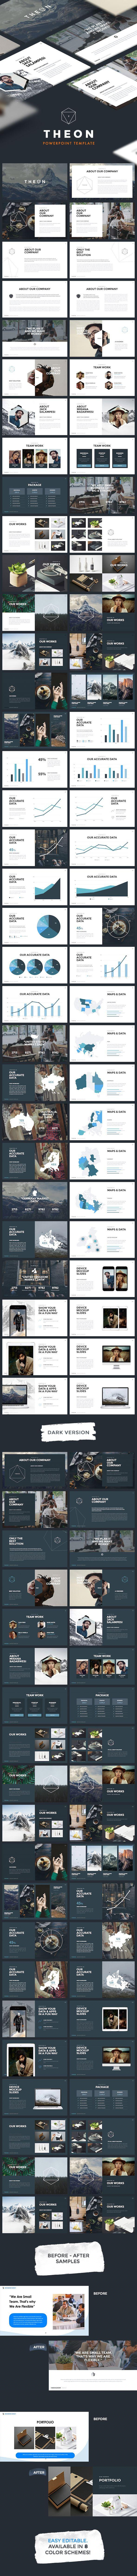 Modern Minimal Powerpoint Template (Theon) - Creative PowerPoint Templates